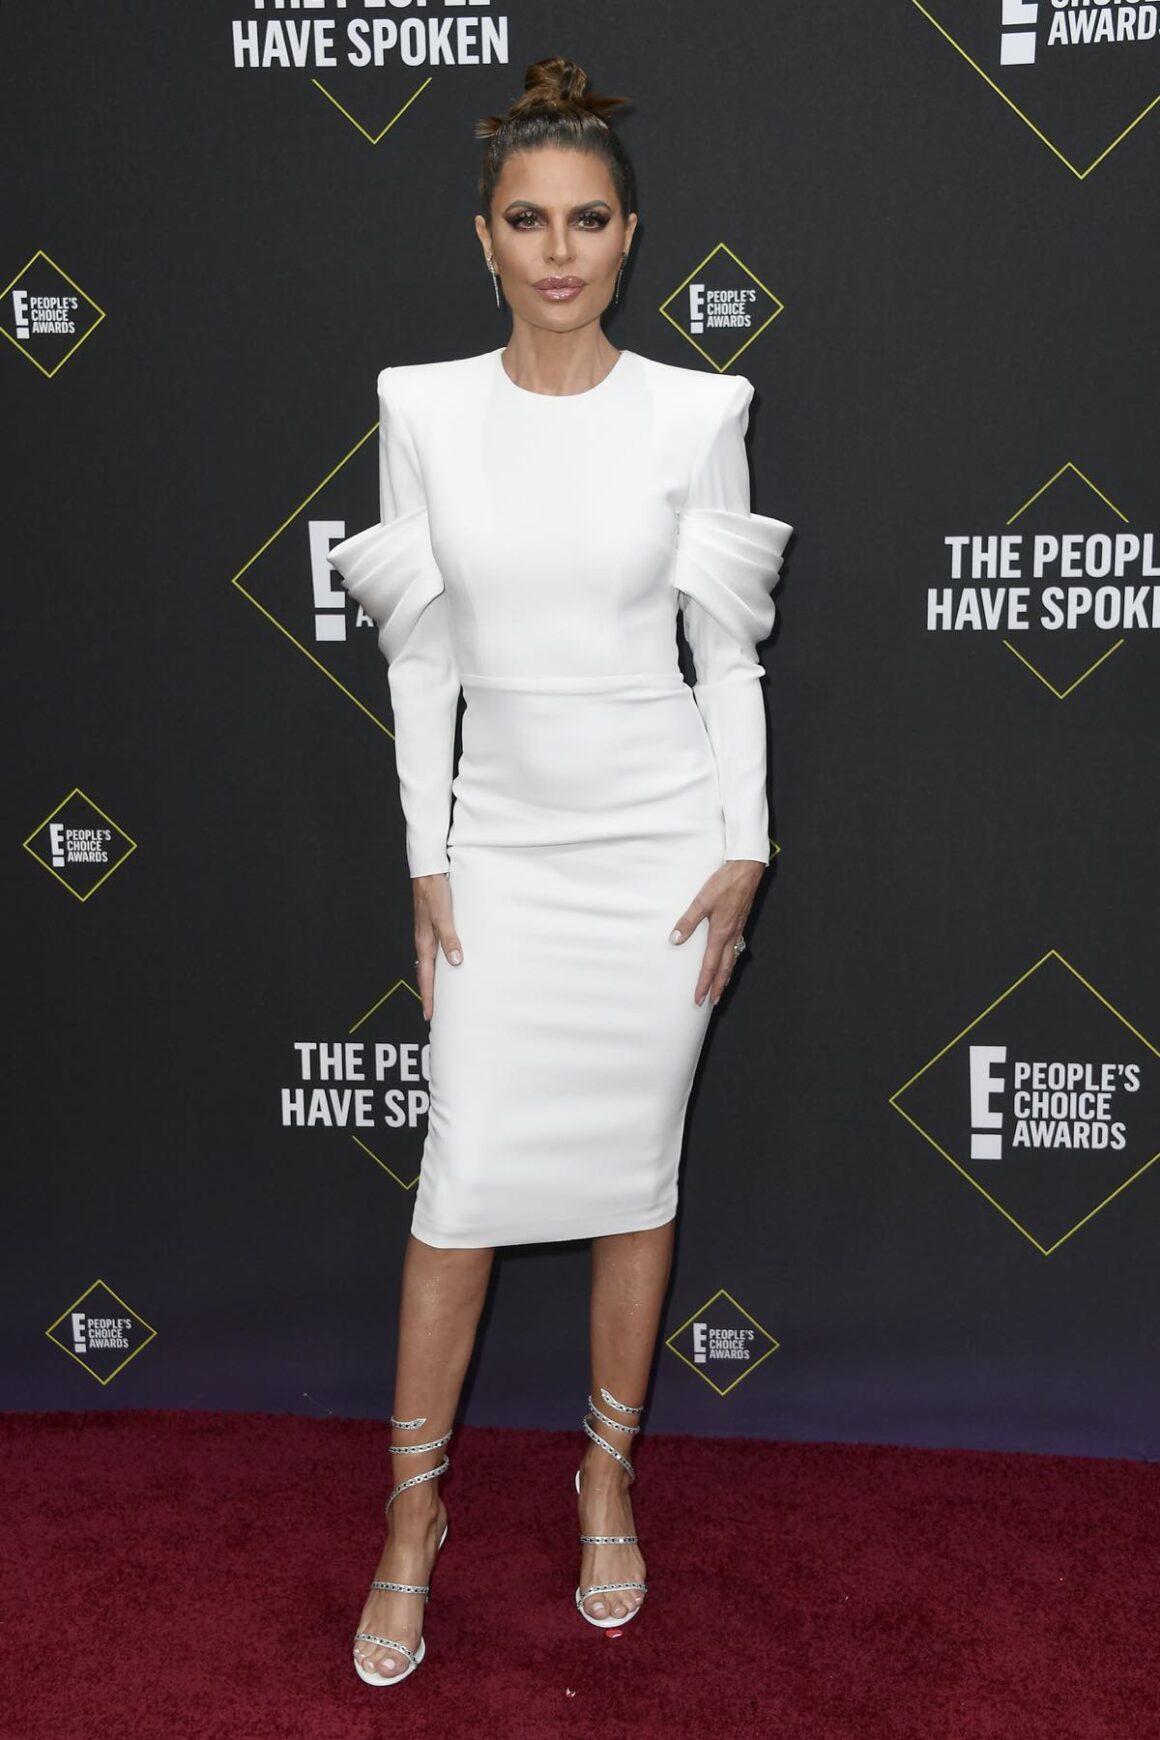 Lisa Rinna 2019 E! People's Choice Awards - Arrivals